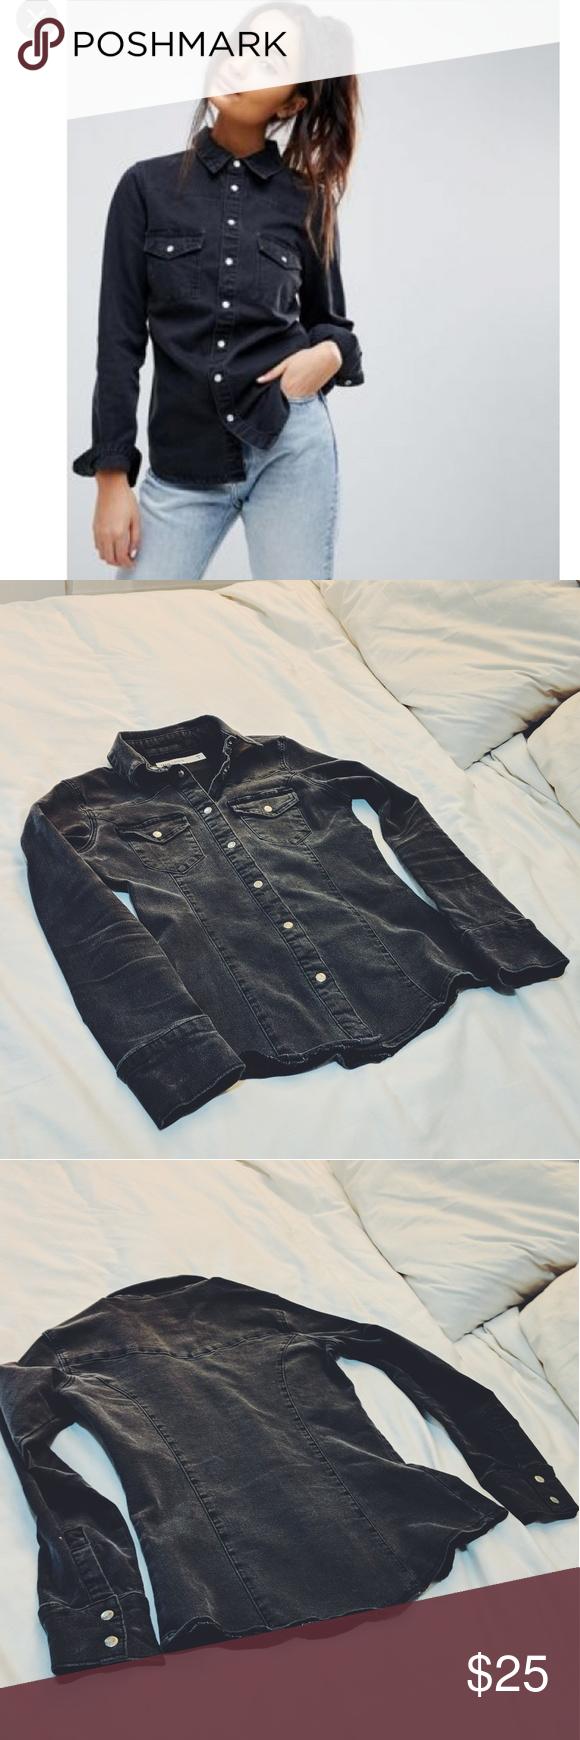 efa612bcf6e ASOS denim fitted western shirt in washed black Asos denim fitted western  shirt in washed black